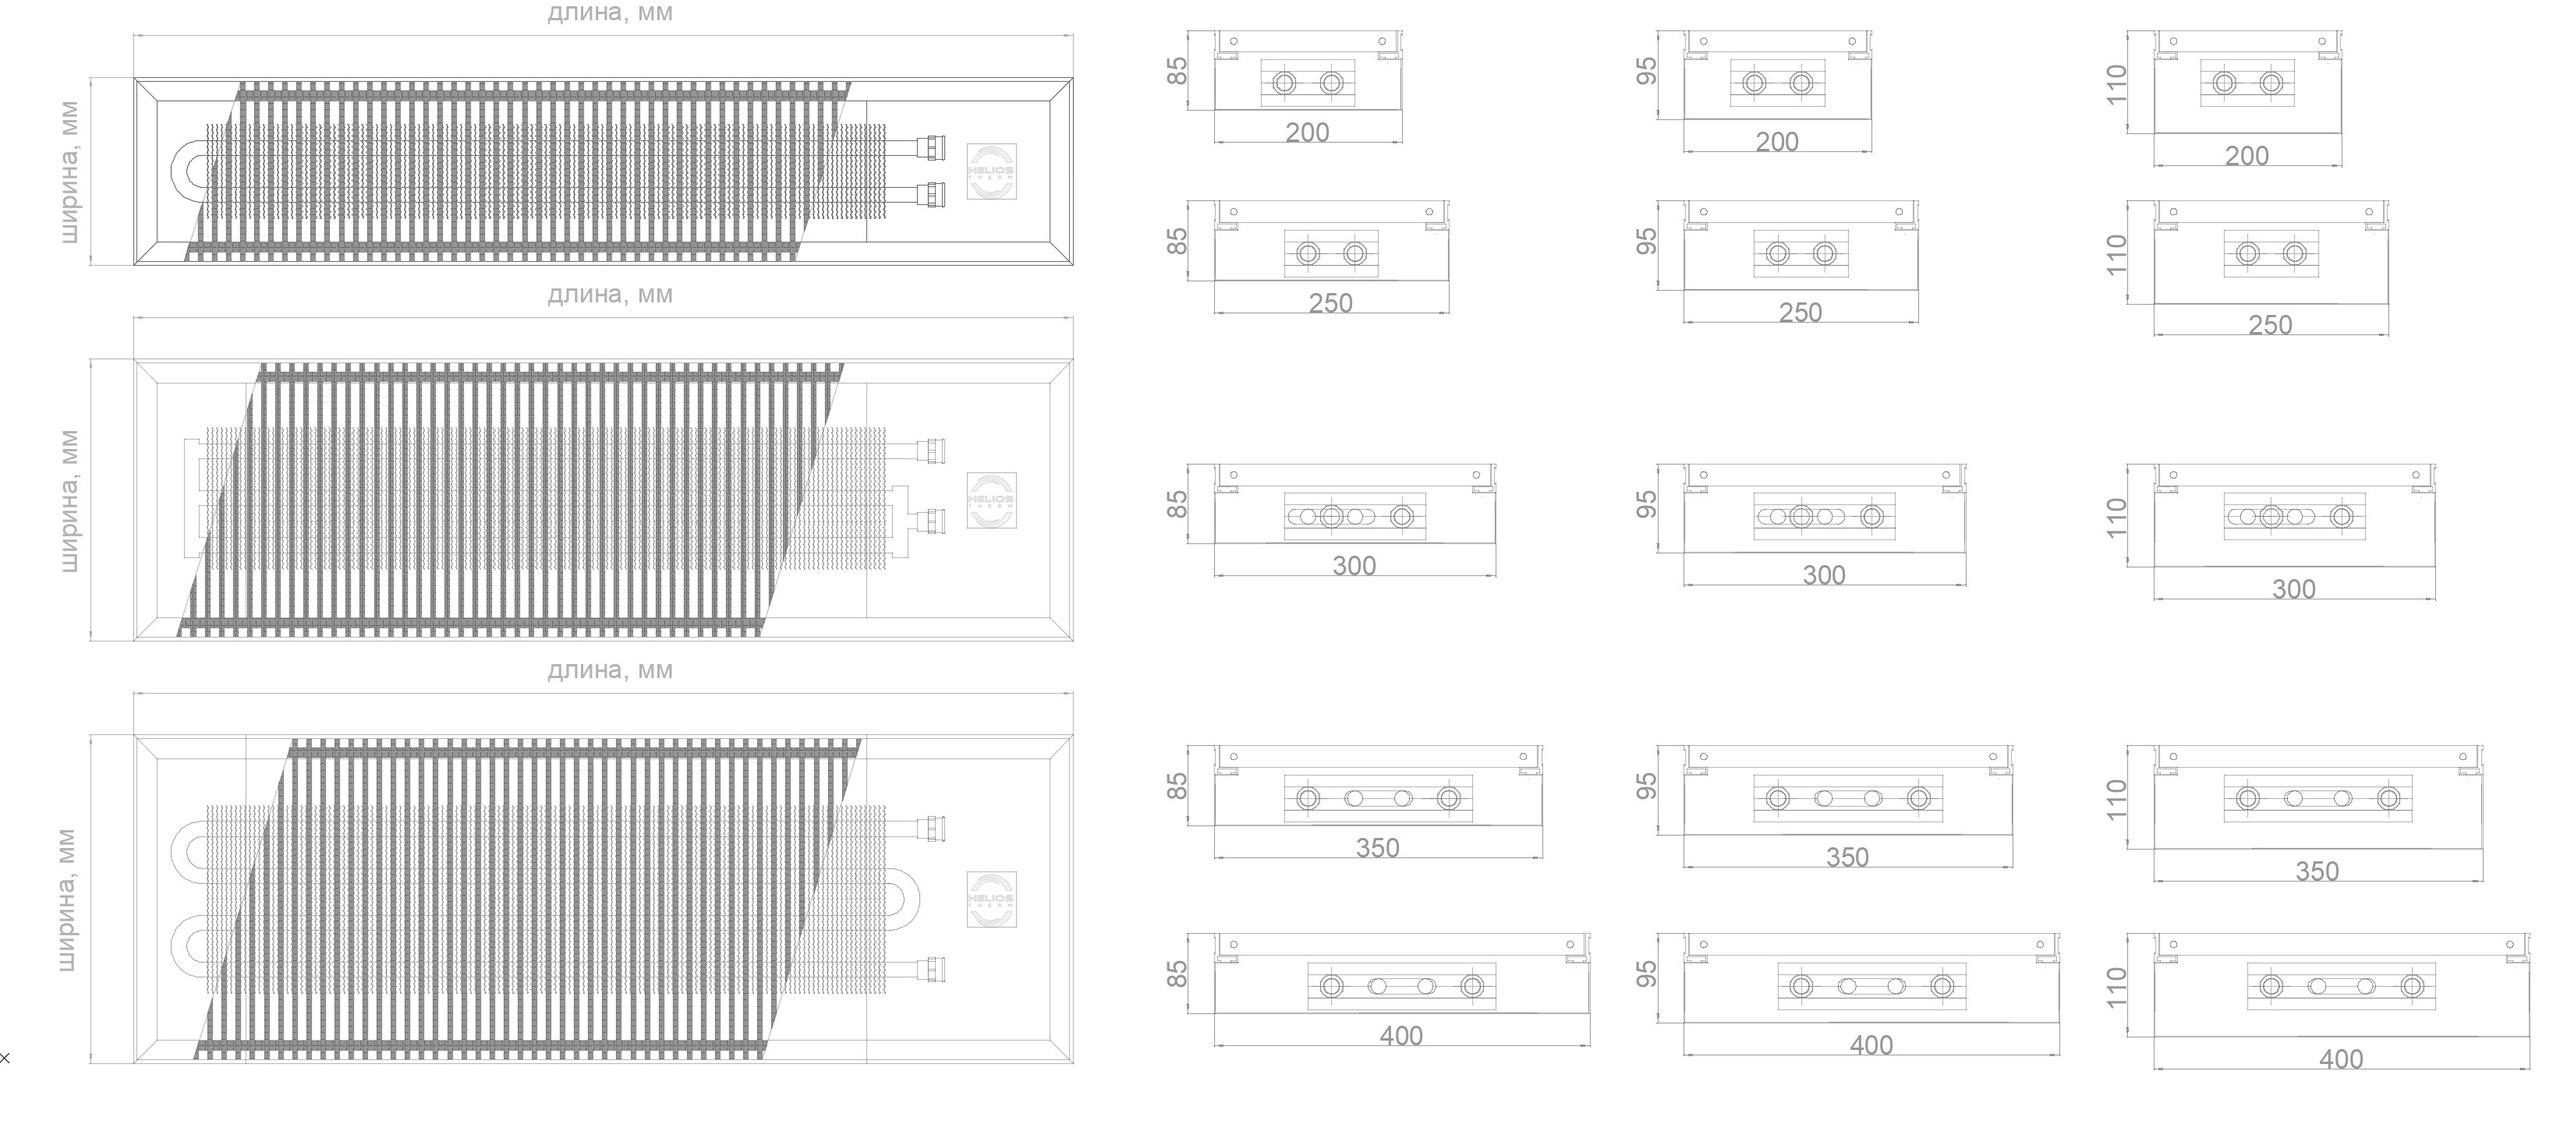 Схема конвектора CIA шириной 200 мм, 250 мм, 300 мм, 350 мм и 400 мм